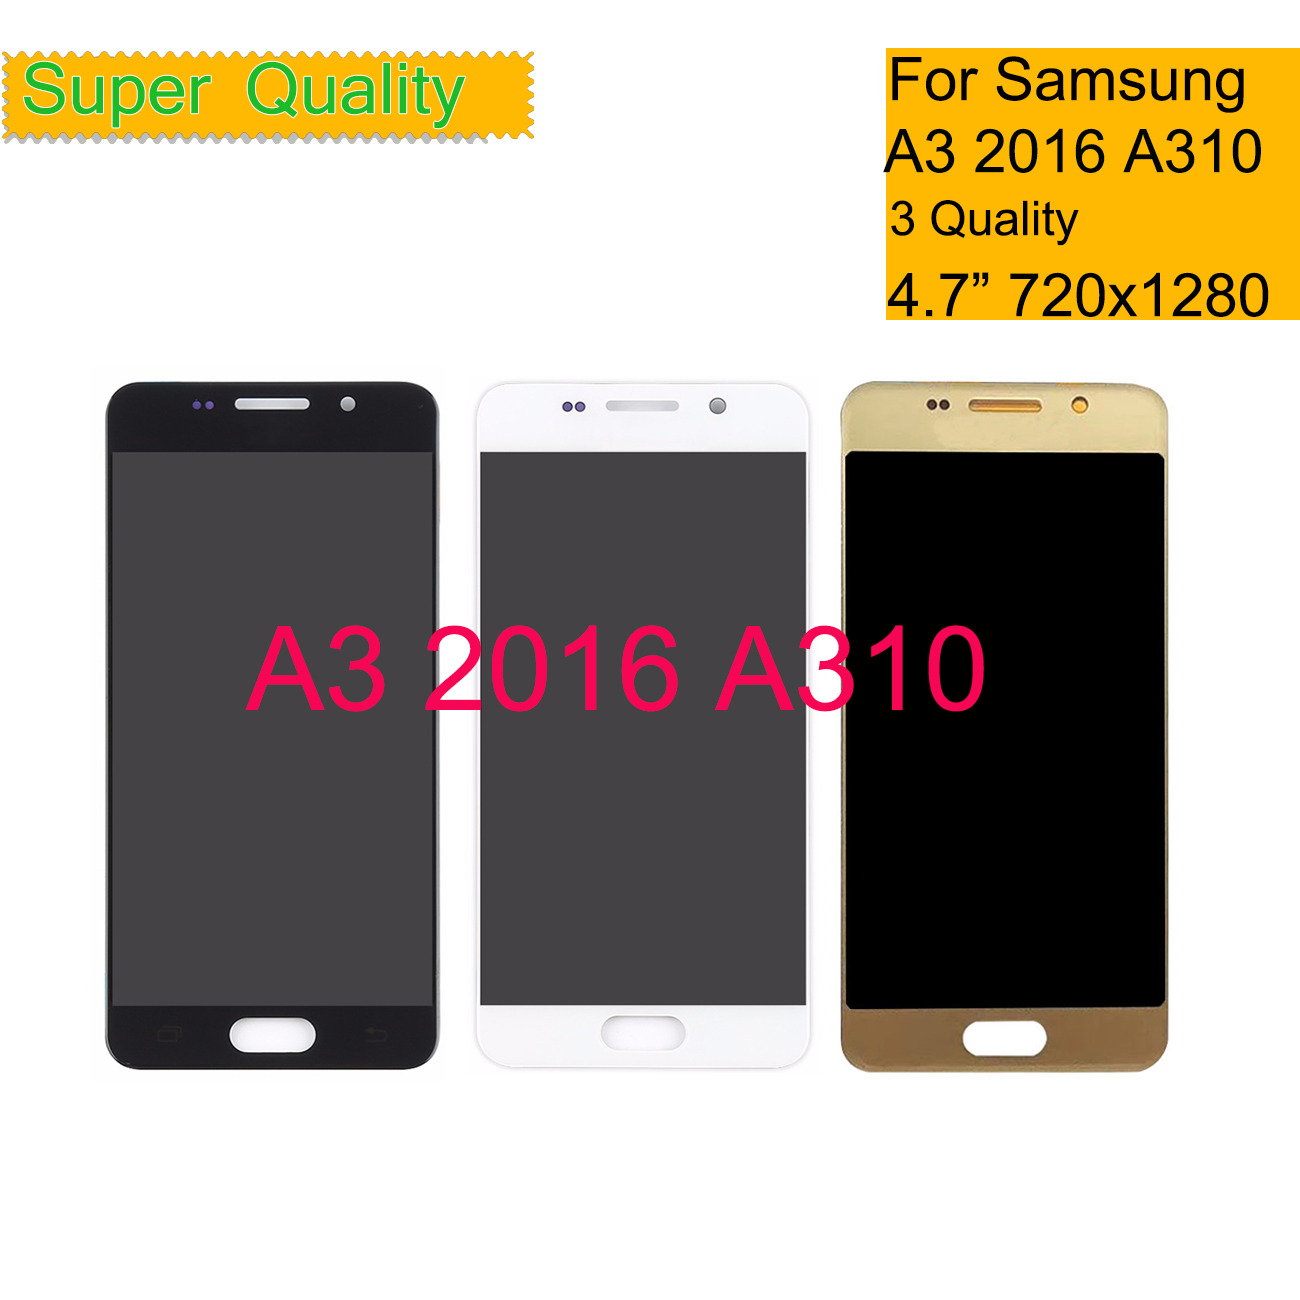 A310 For Samsung Galaxy A3 2016 A310 A310F A310H A310M Touch Screen Digitizer Glass LCD Display